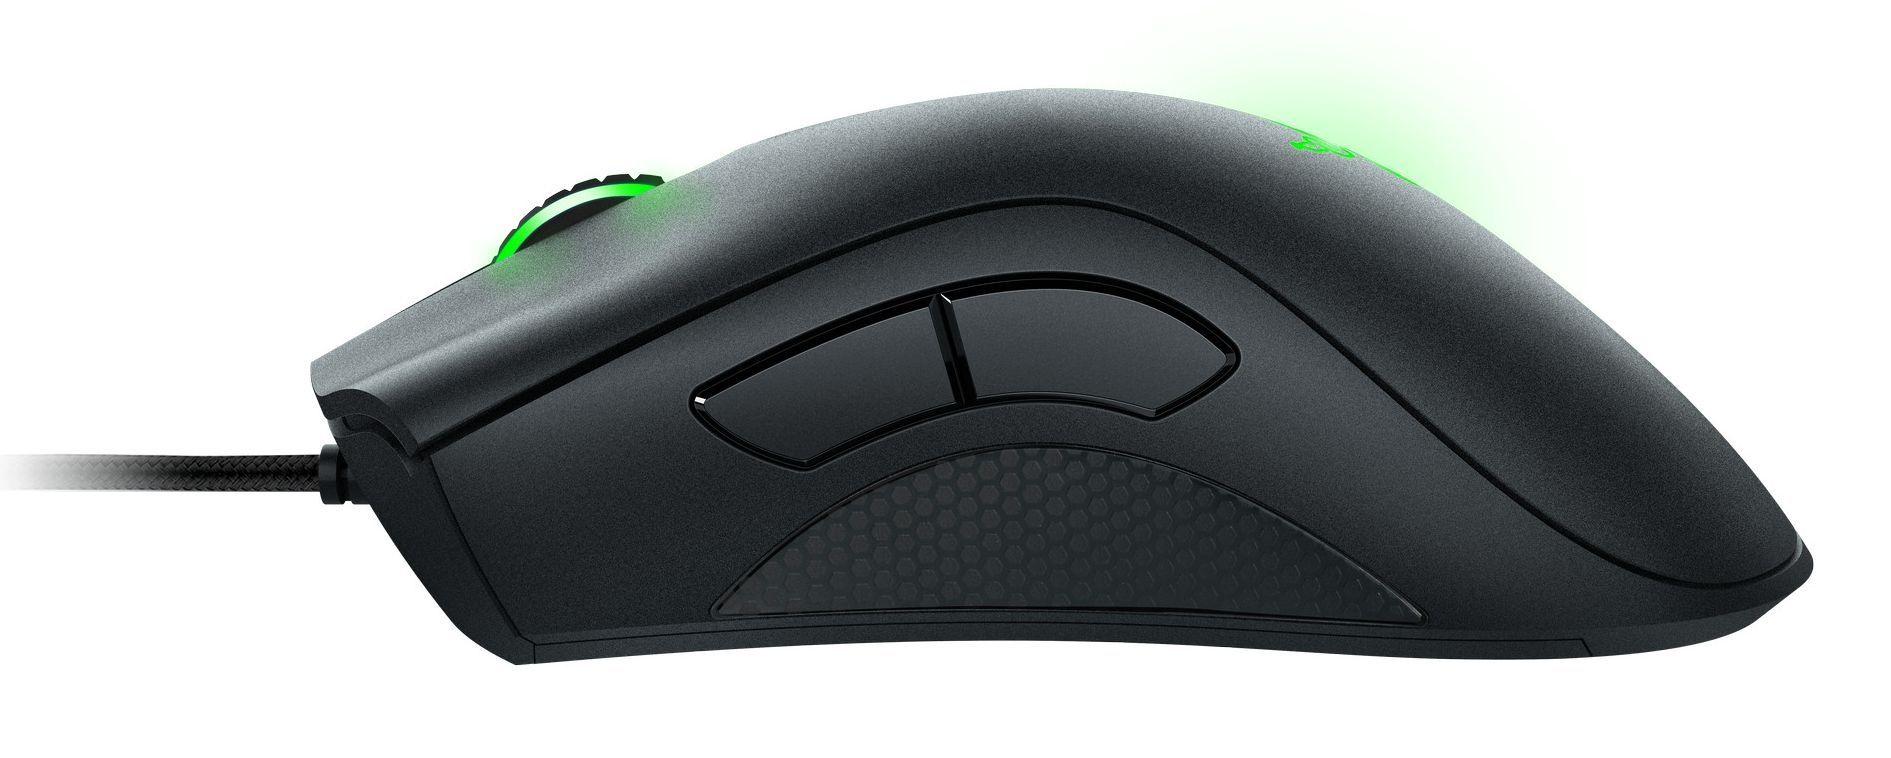 Гейминг мишка Razer DeathAdder Essential - 4